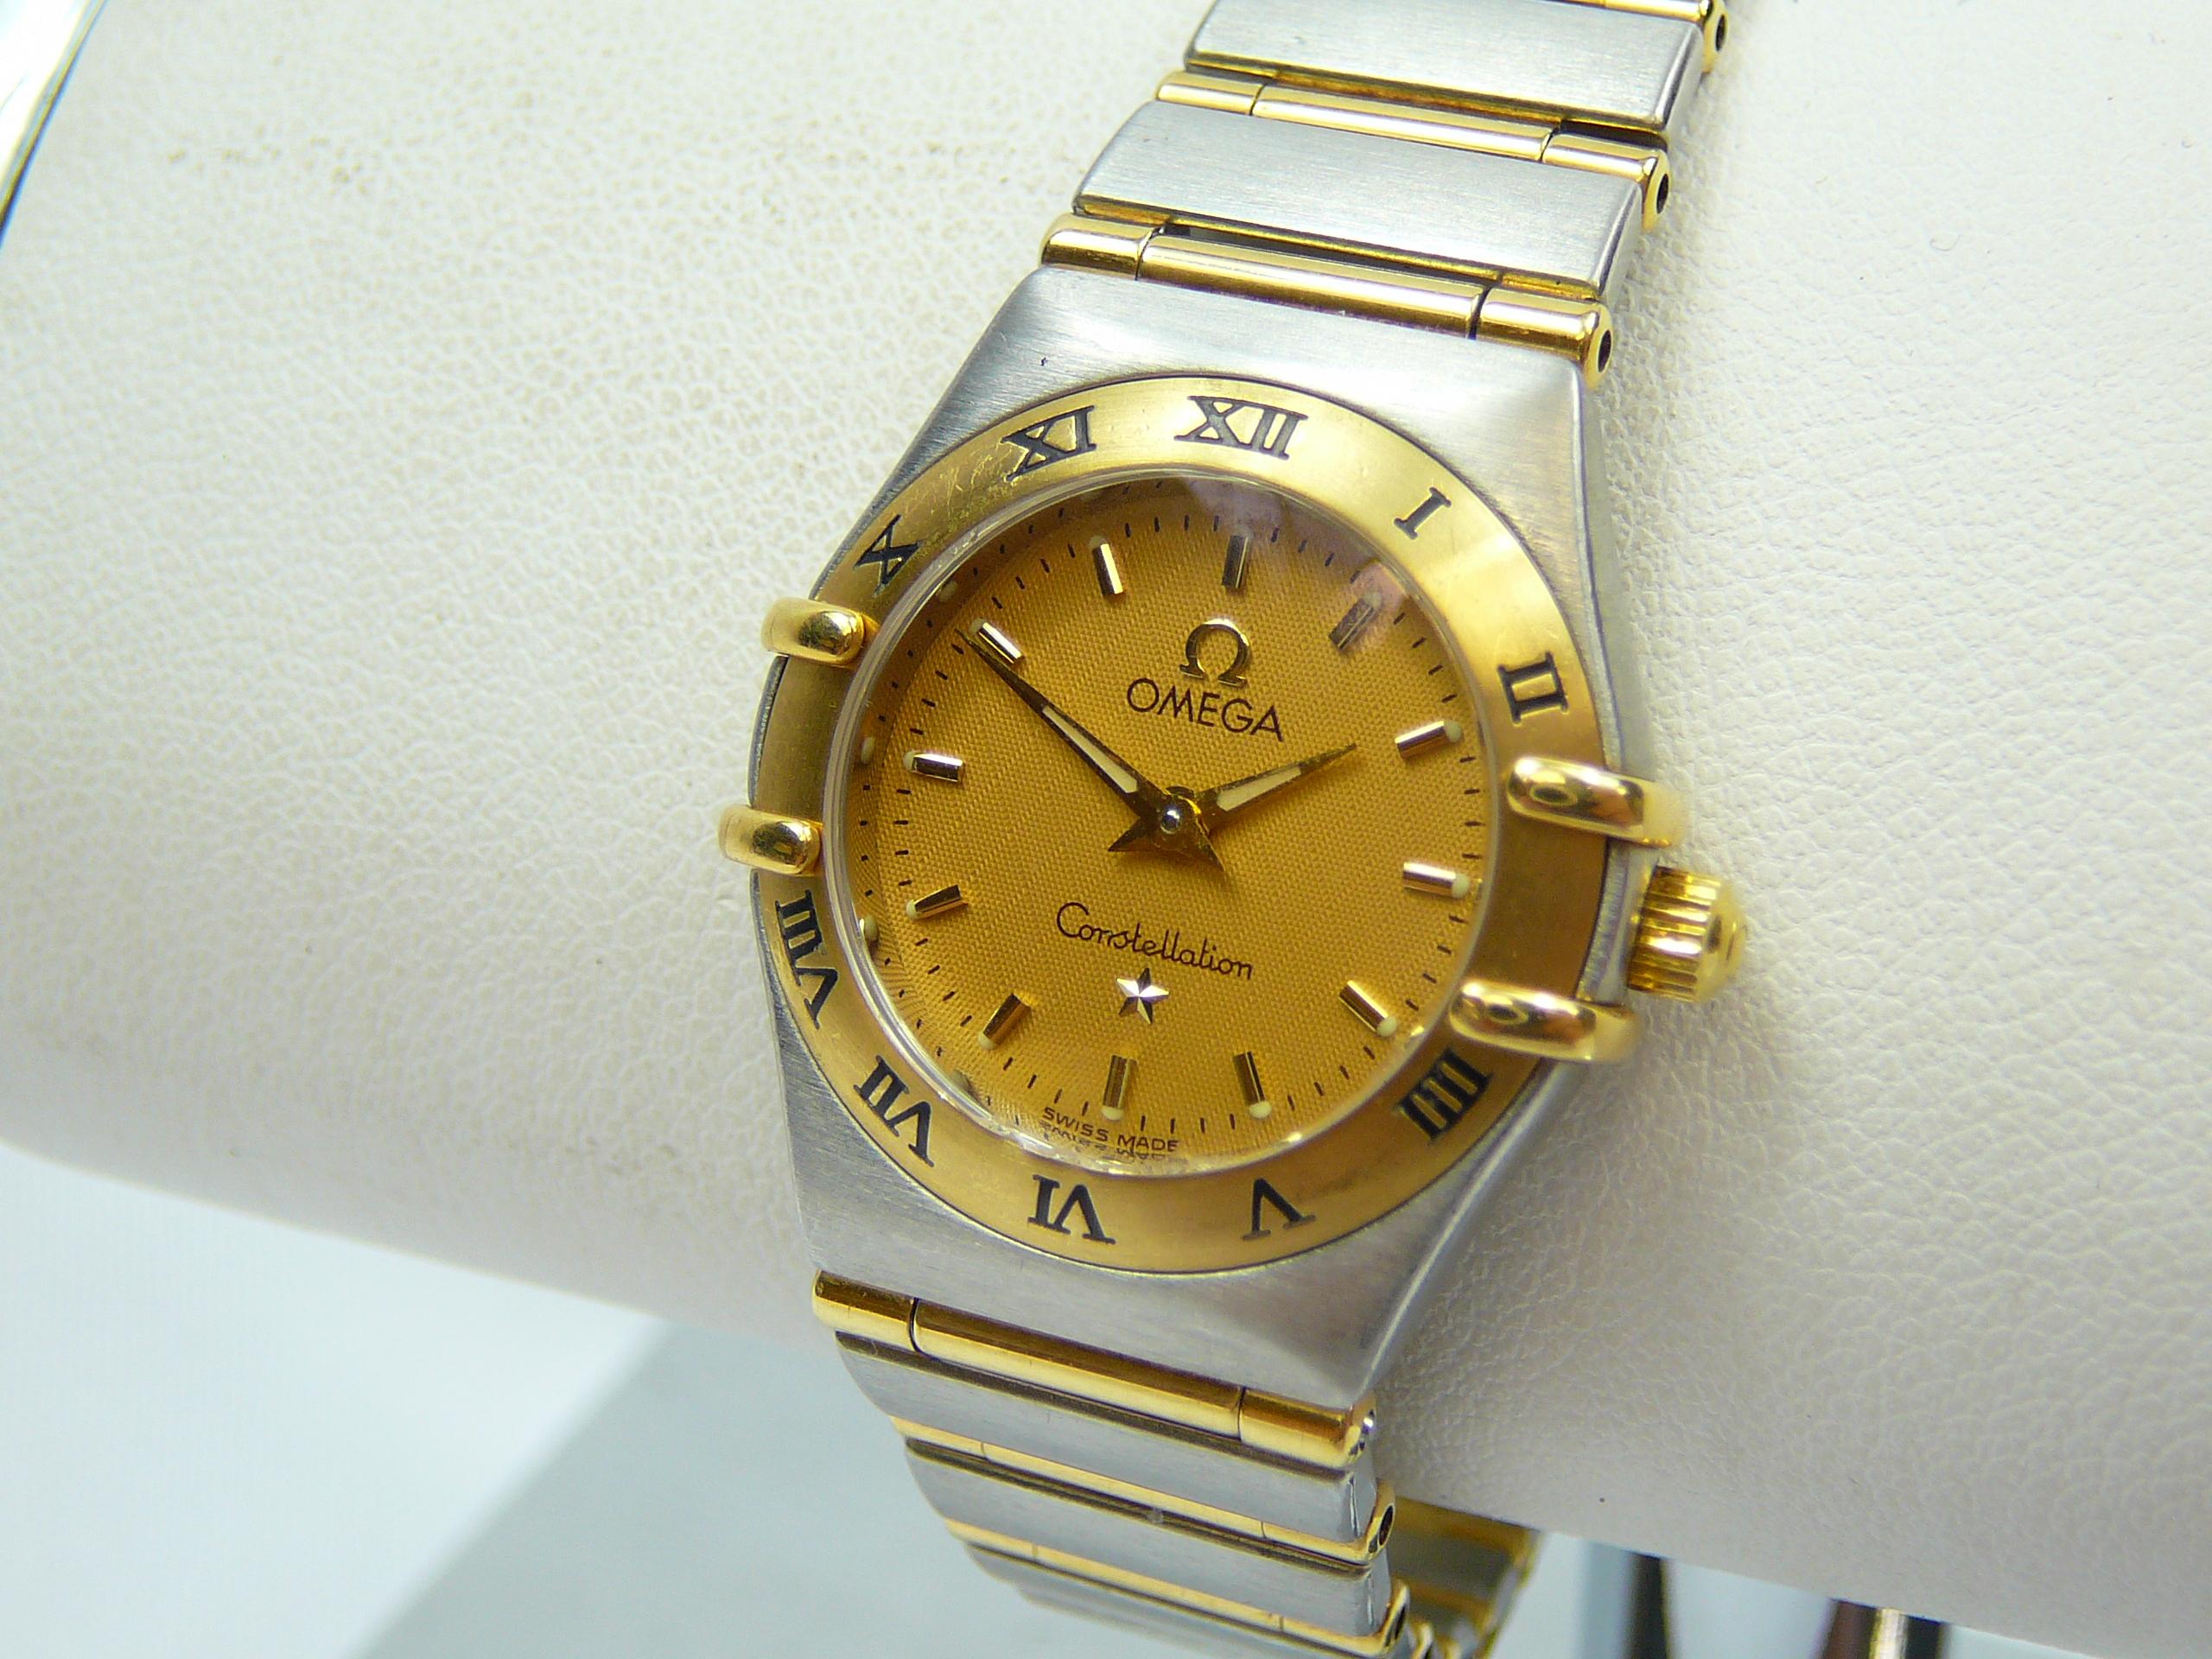 Ladies Omega Wrist Watch - Image 2 of 3